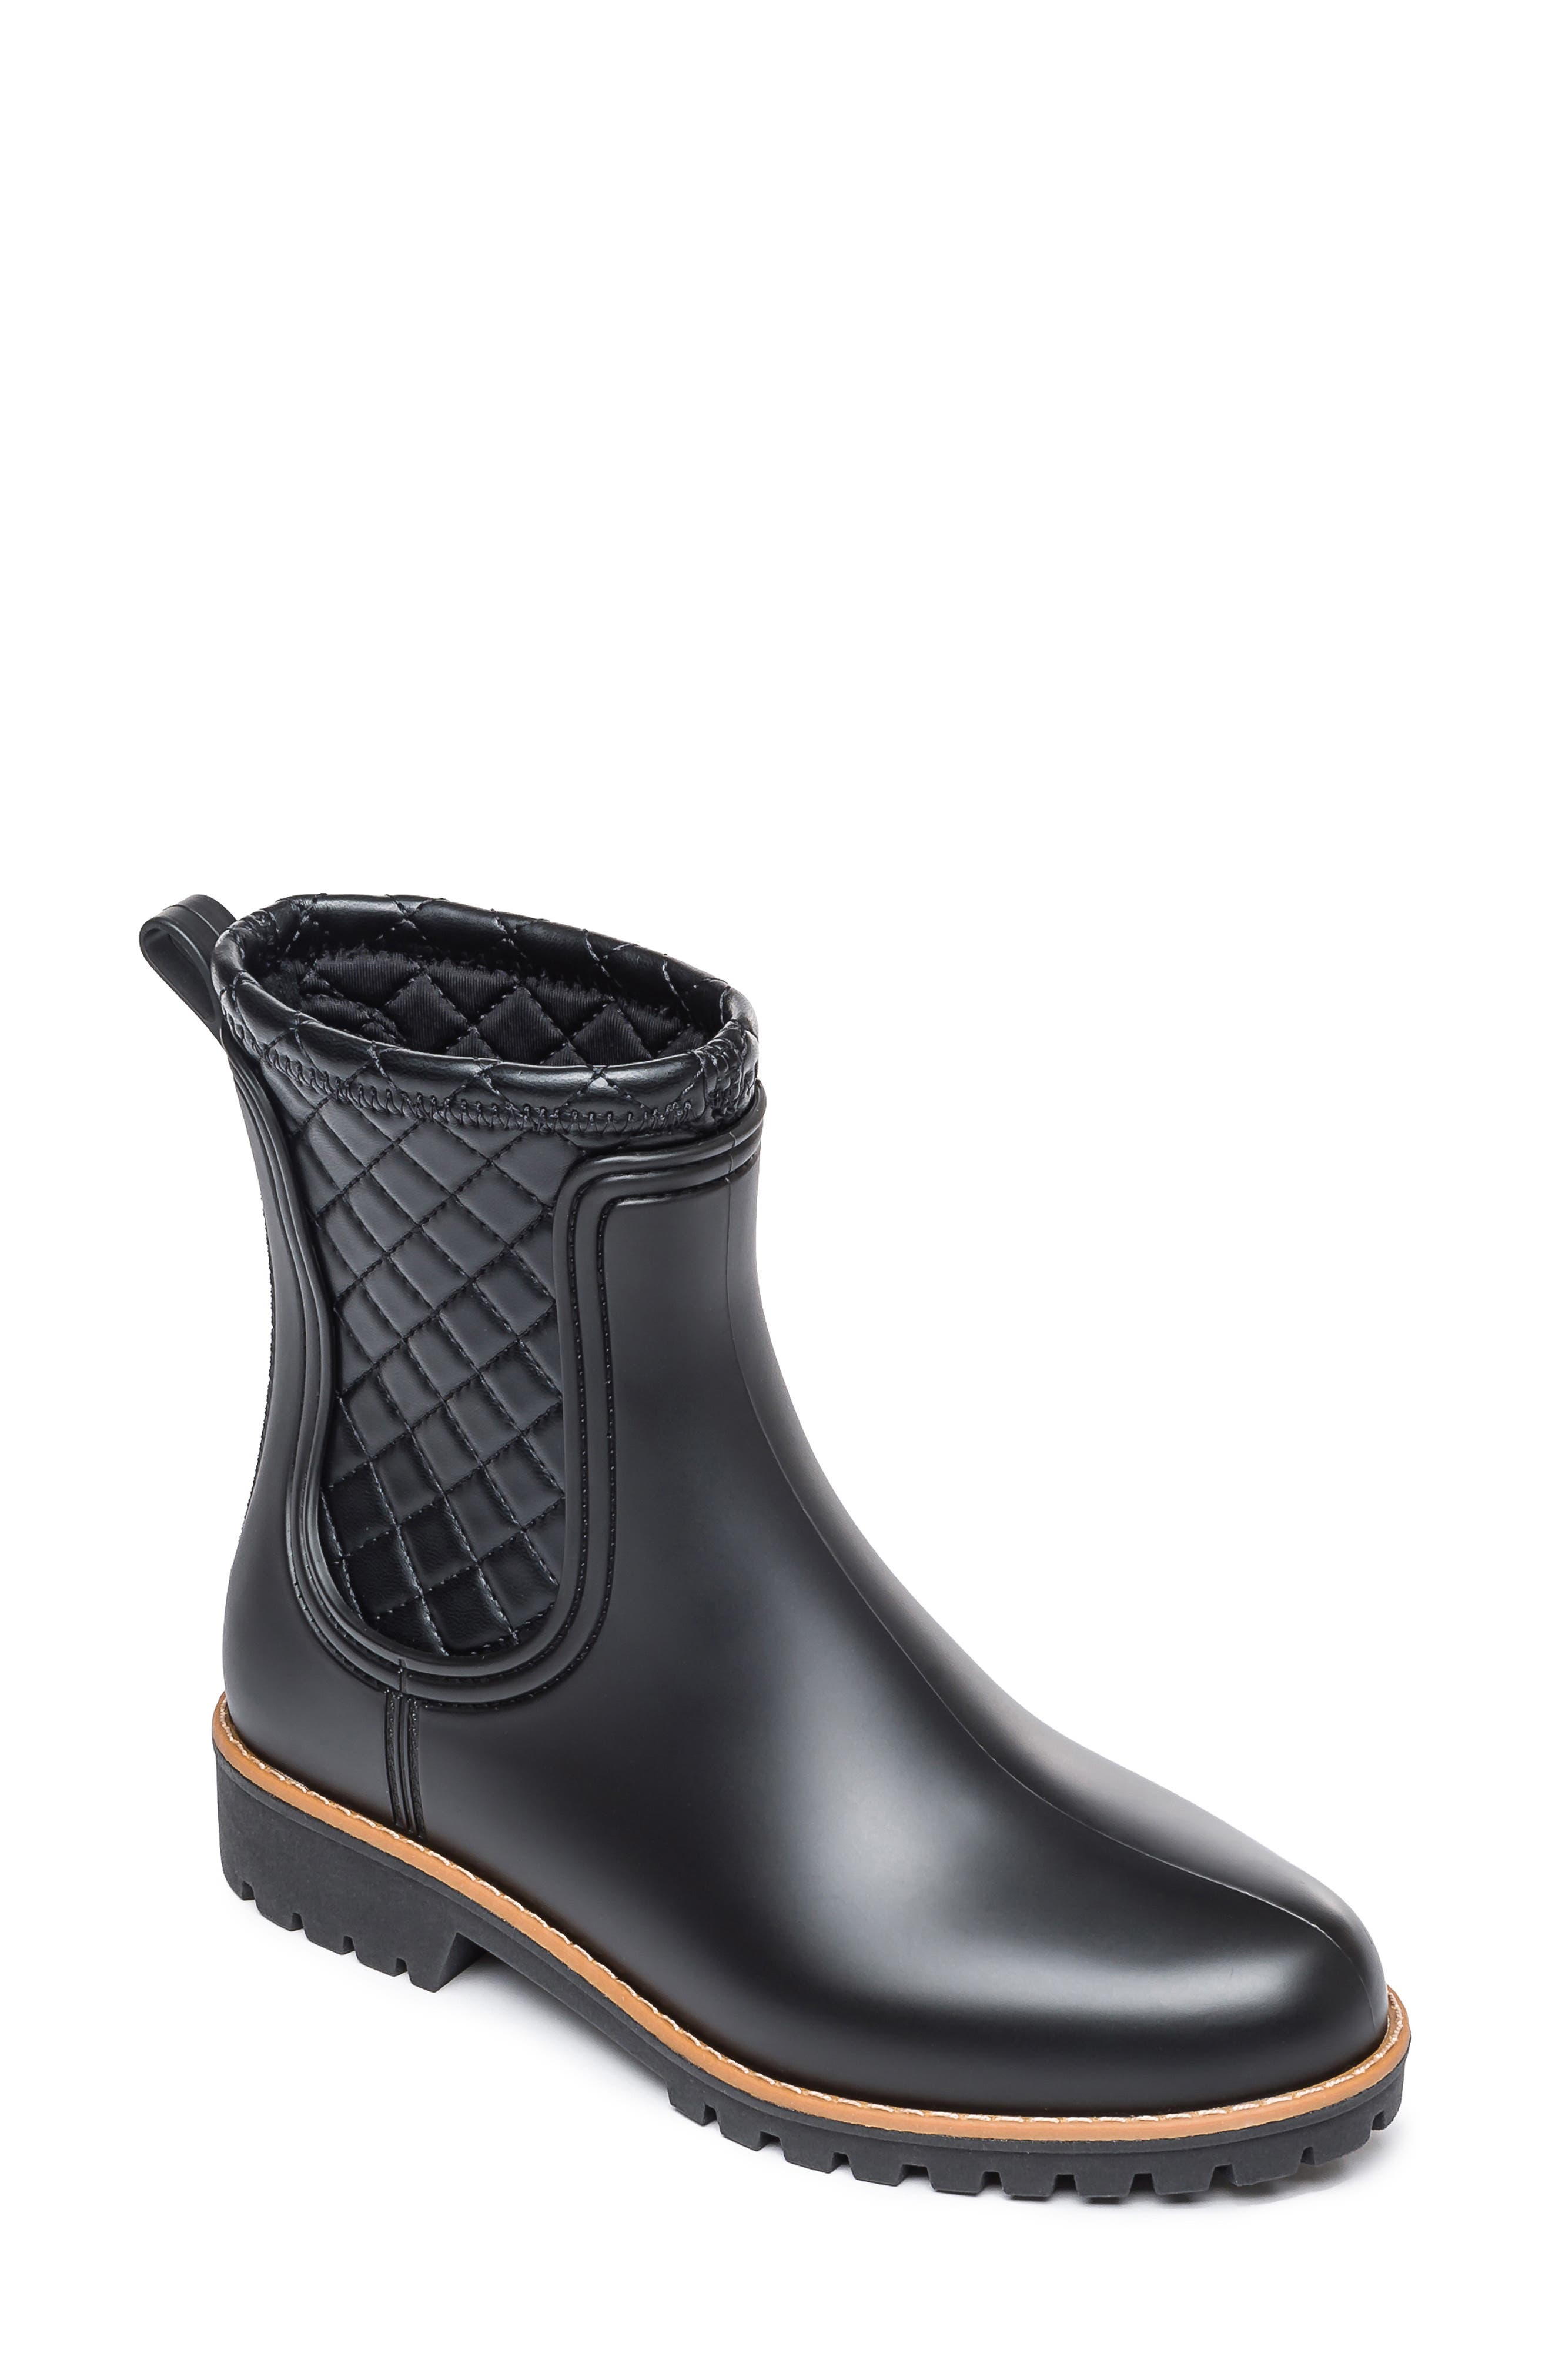 Zora Waterproof Quilted Rain Boot